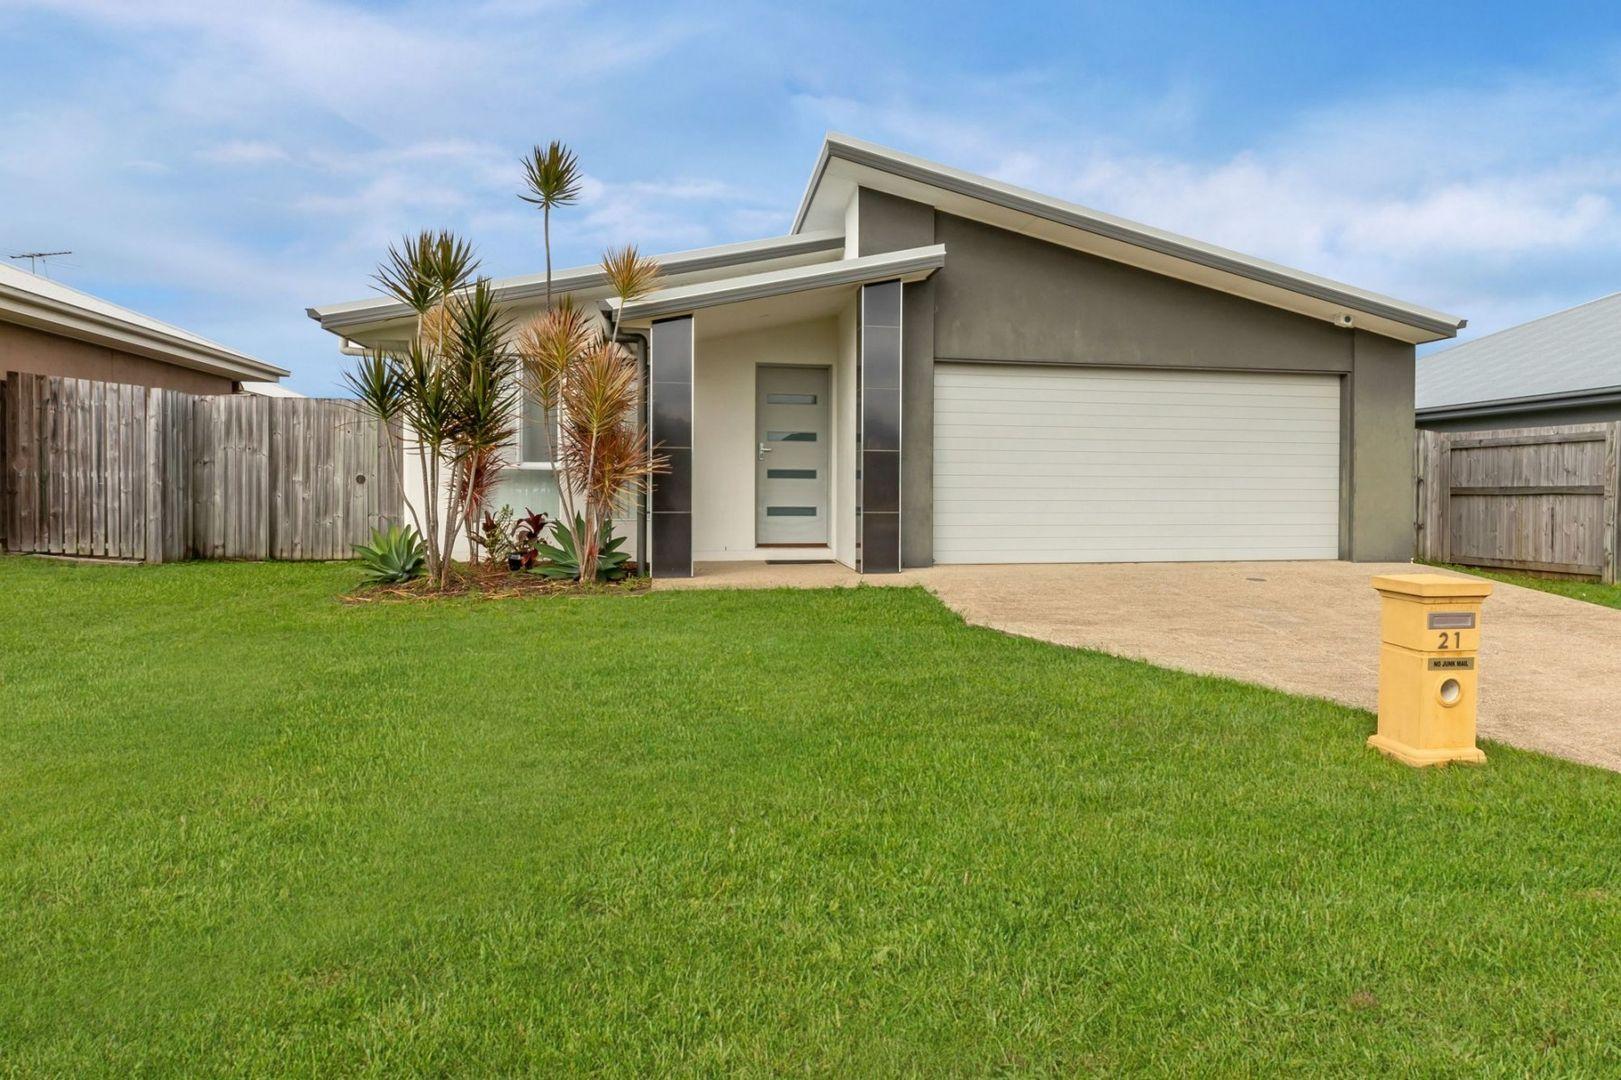 21 Parklane Crescent, Beaconsfield QLD 4740, Image 0